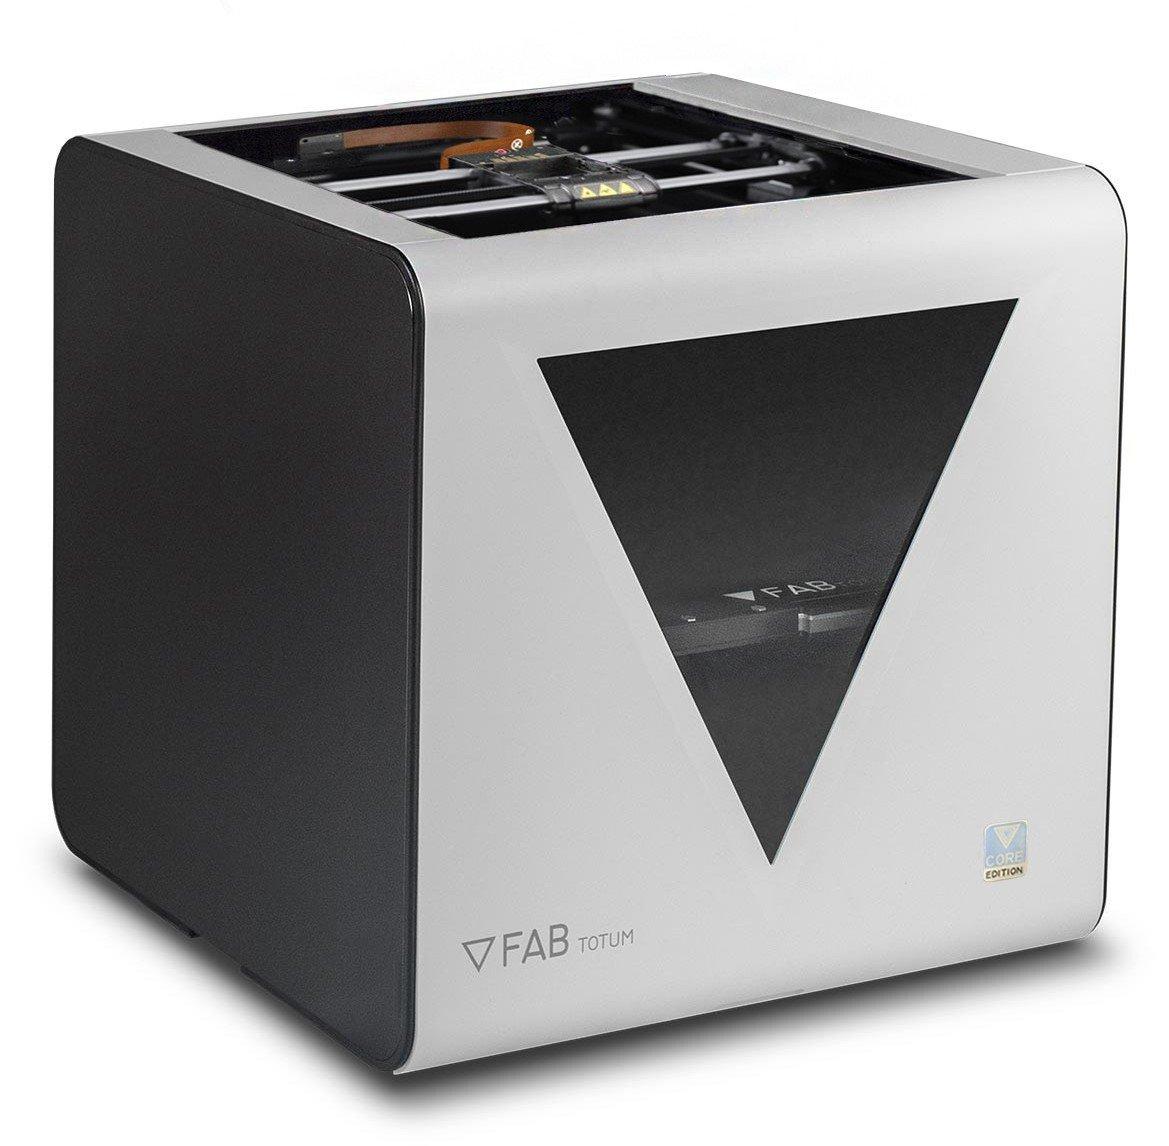 Impresora 3D profesional de alta calidad FABtotum Core PRO 2018 - Color: blanco